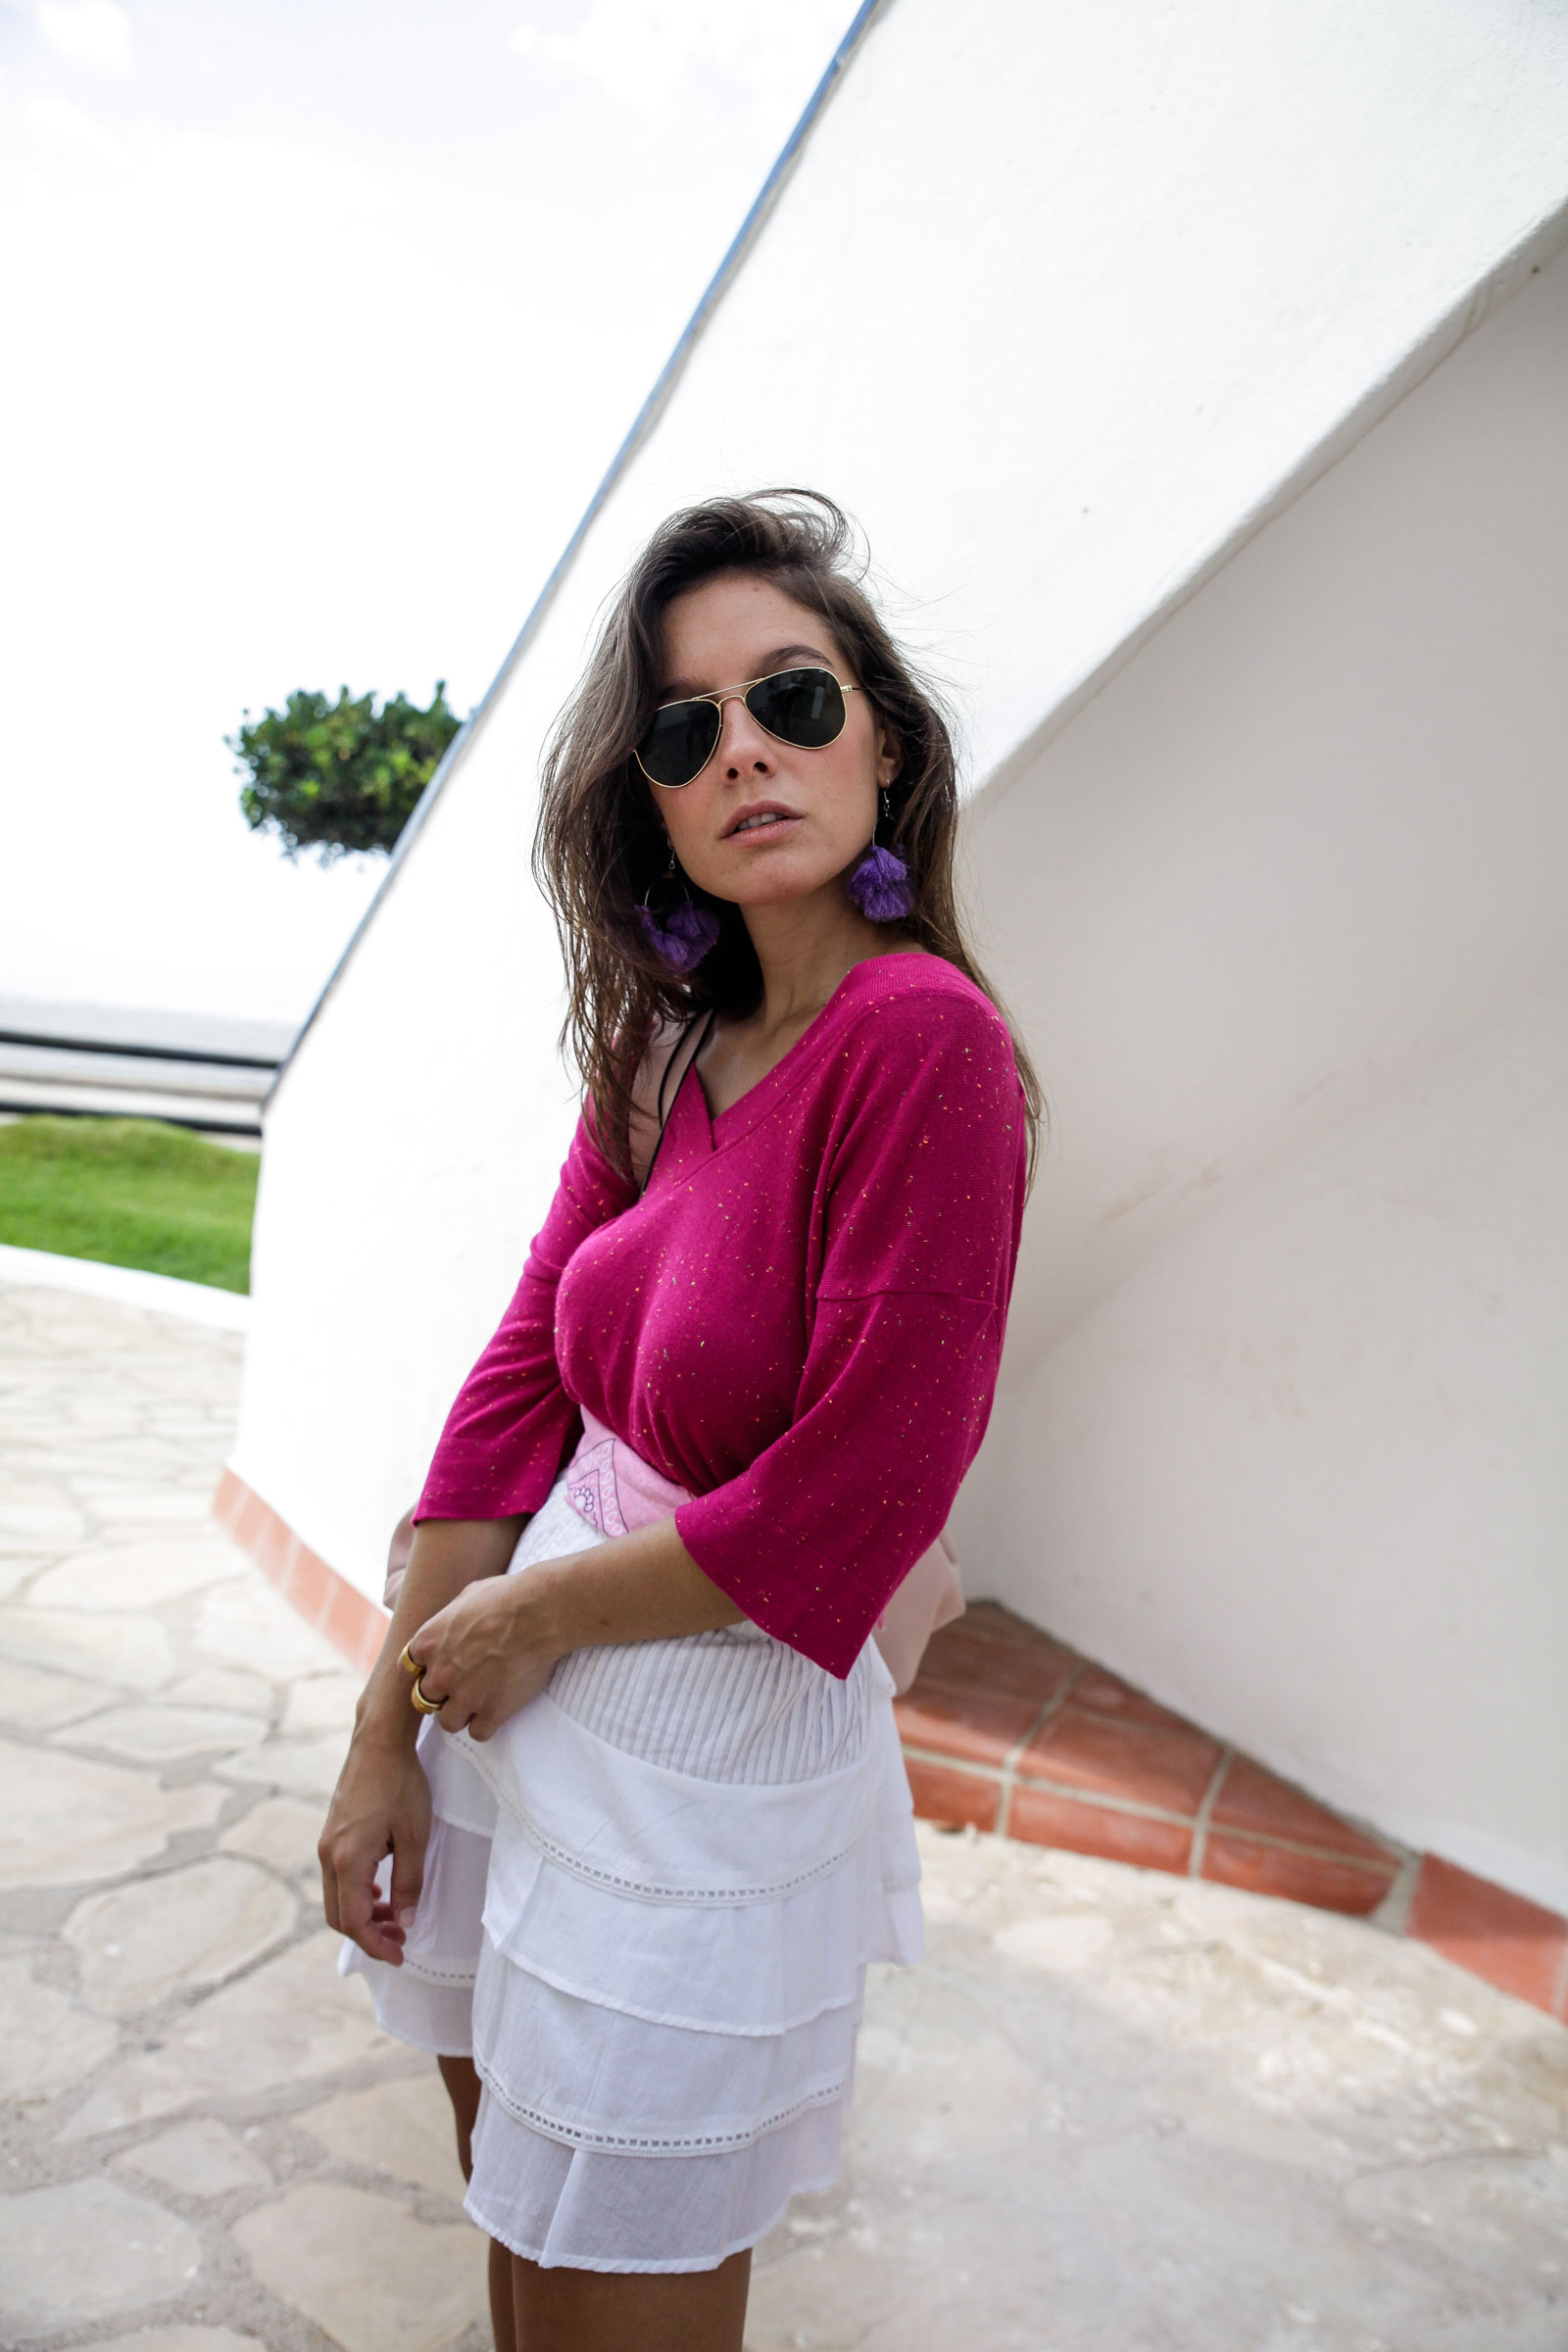 010_Camiseta_rosa_rüga_falda_blanca_look_verano_theguestgirl_laura_influencer_barcelona_españa_spain_ootd_inspo